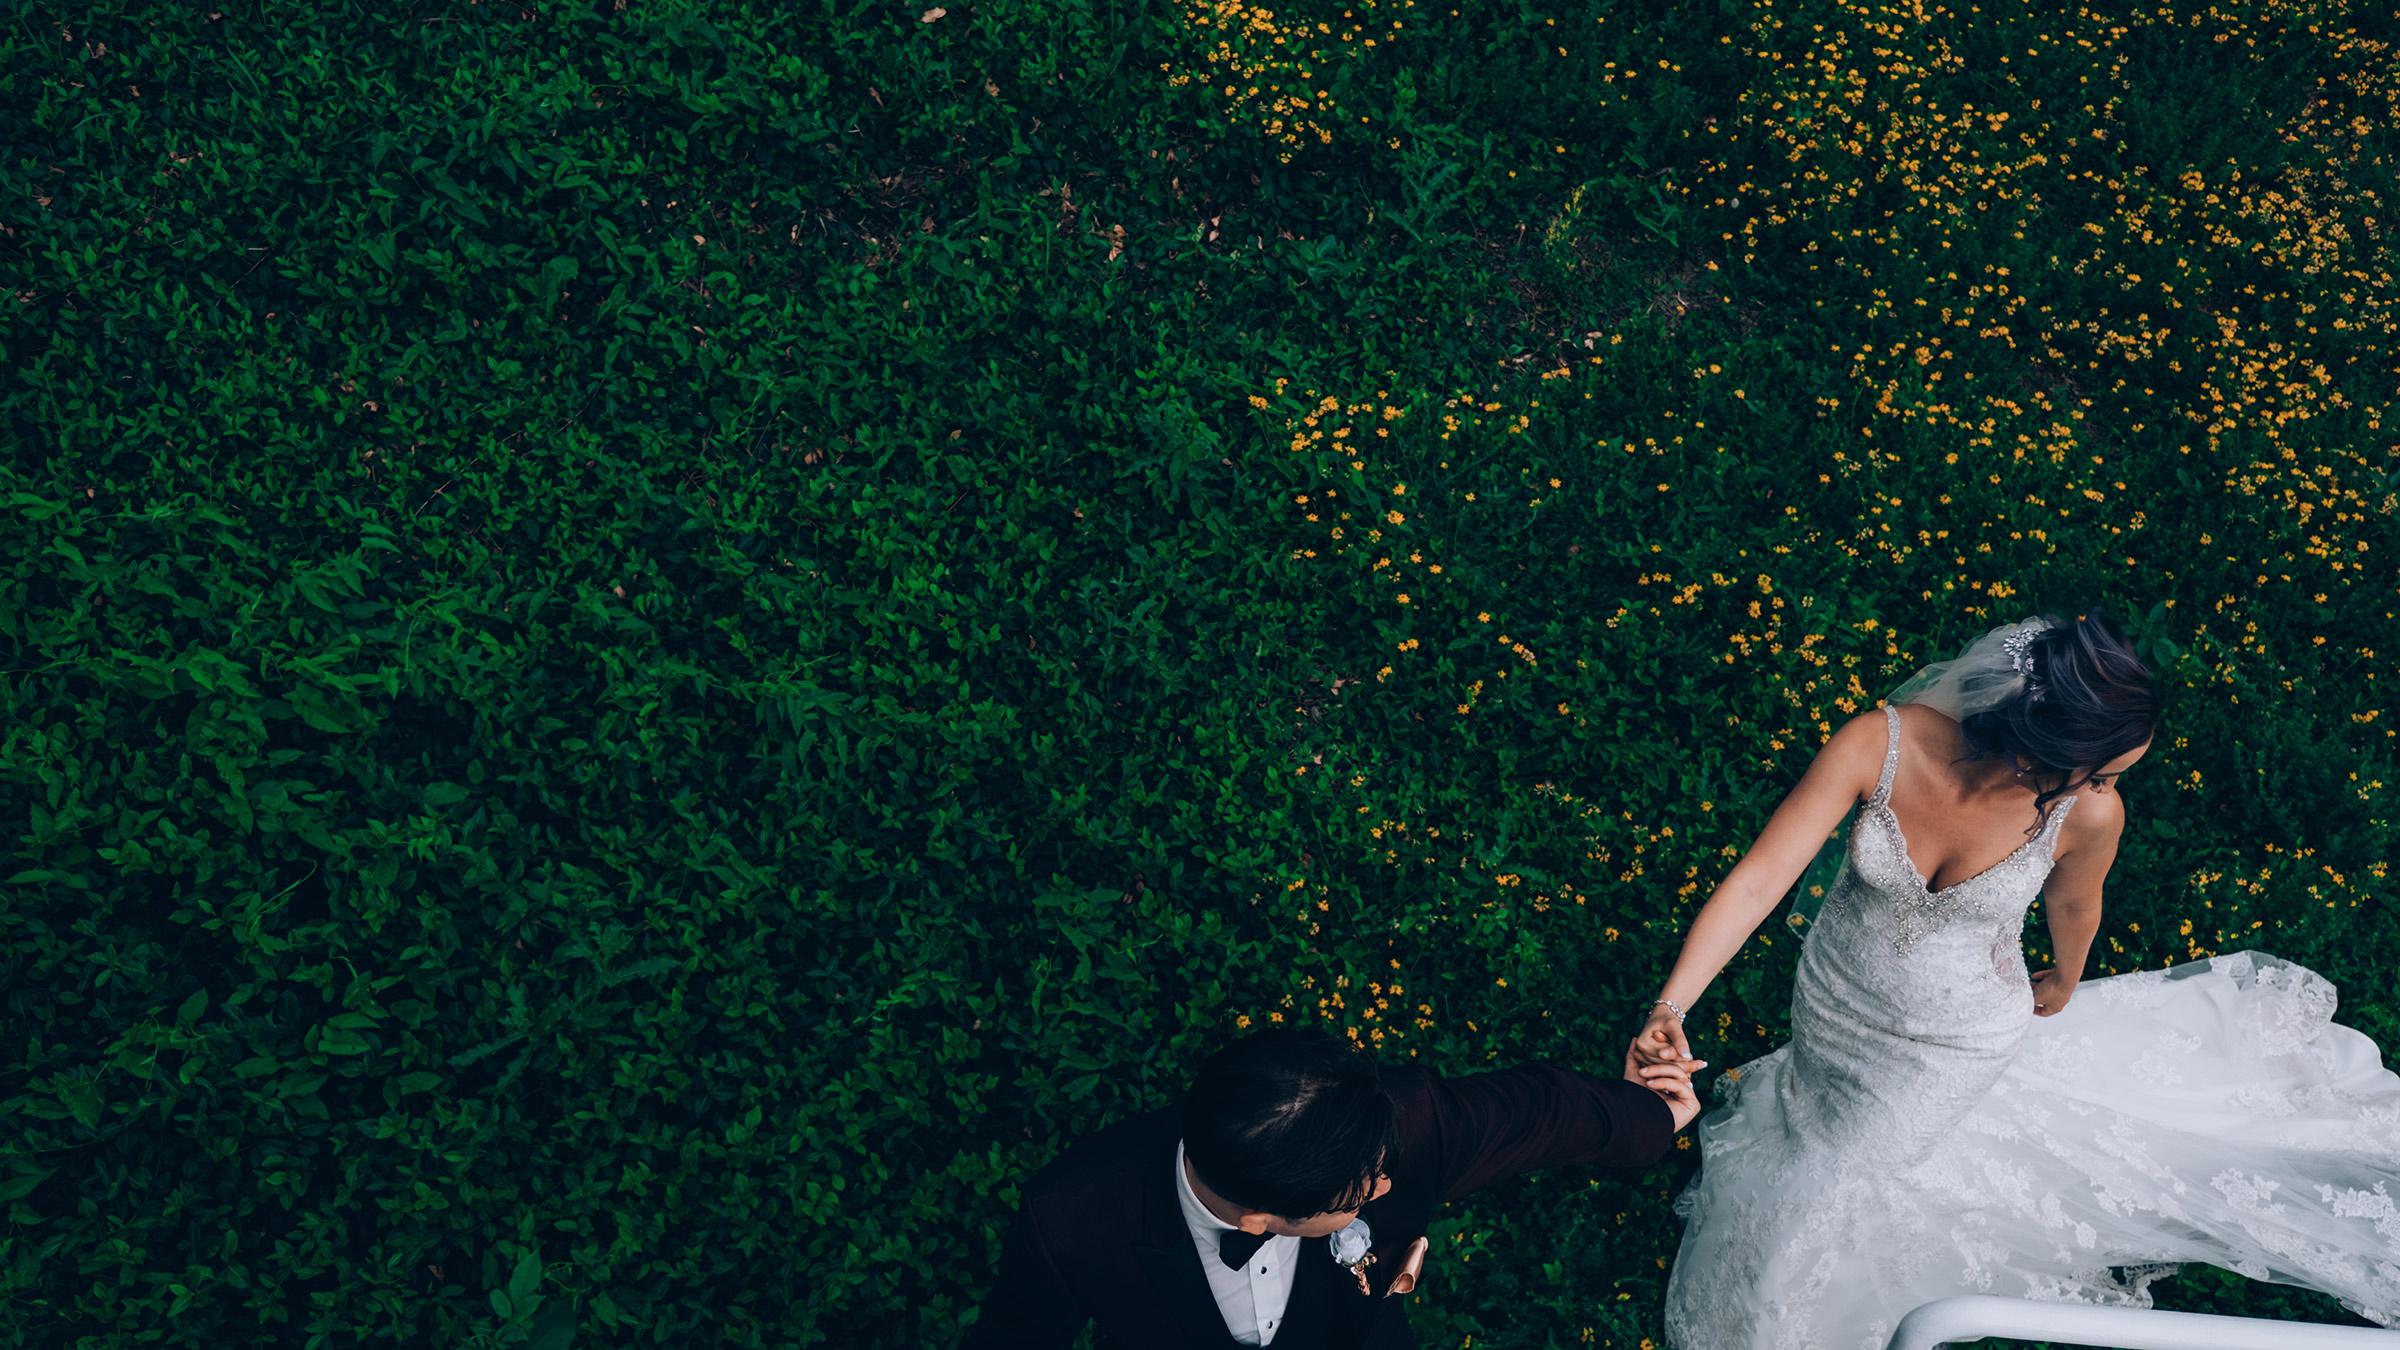 couple-walking-holding-hands-wedding-art-center-raelyn-ramey-photography.jpg